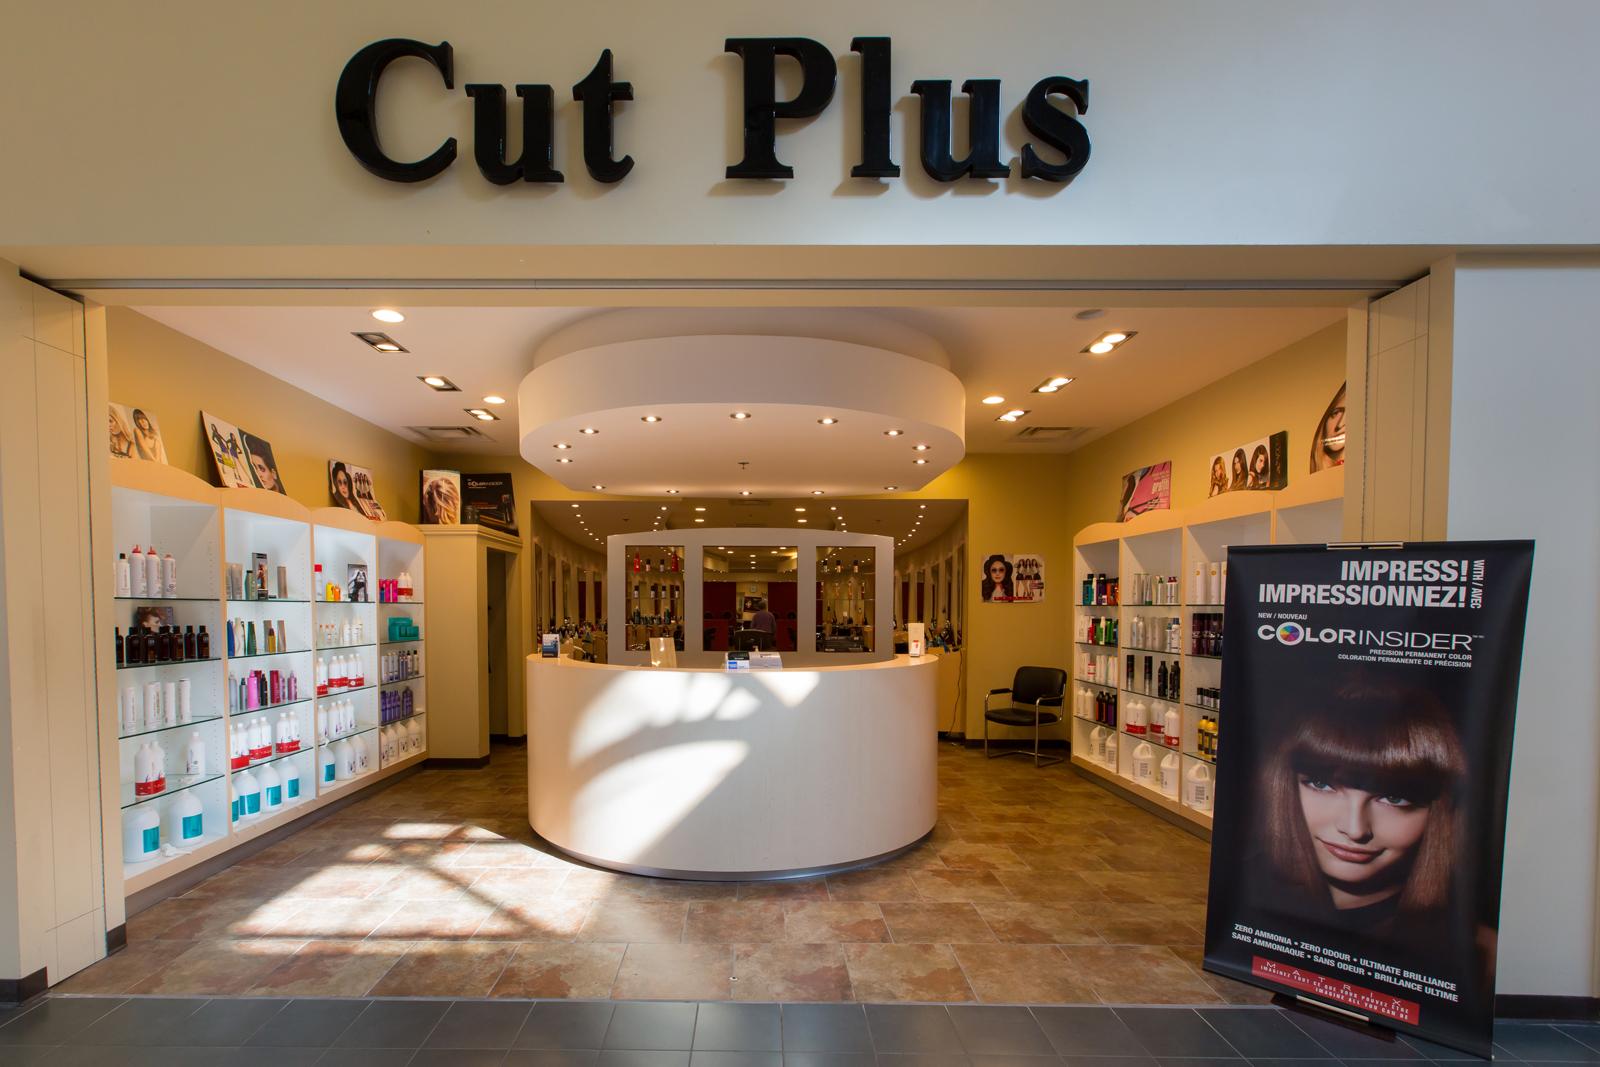 Cut Plus